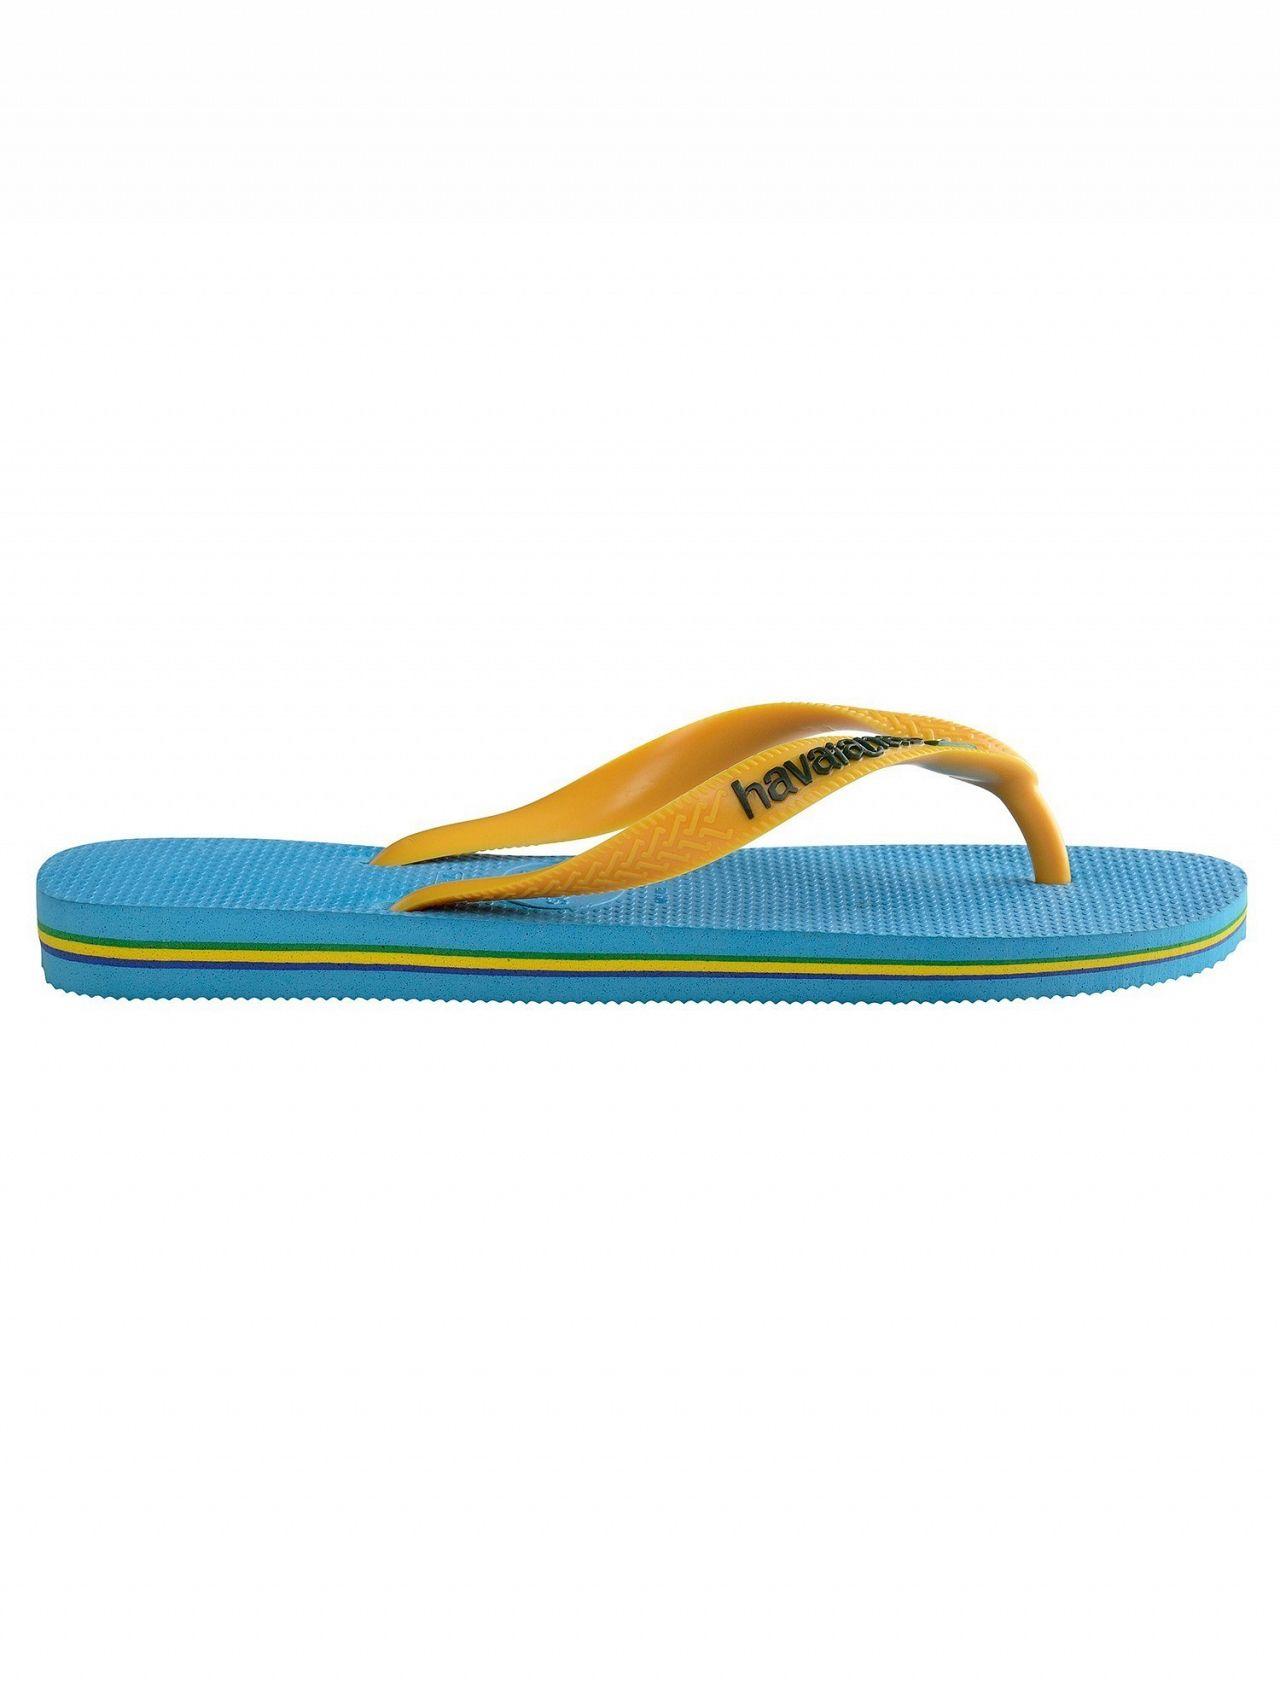 17e408ed8e121c Havaianas Turquoise Yellow Brasil Logo Flip Flops